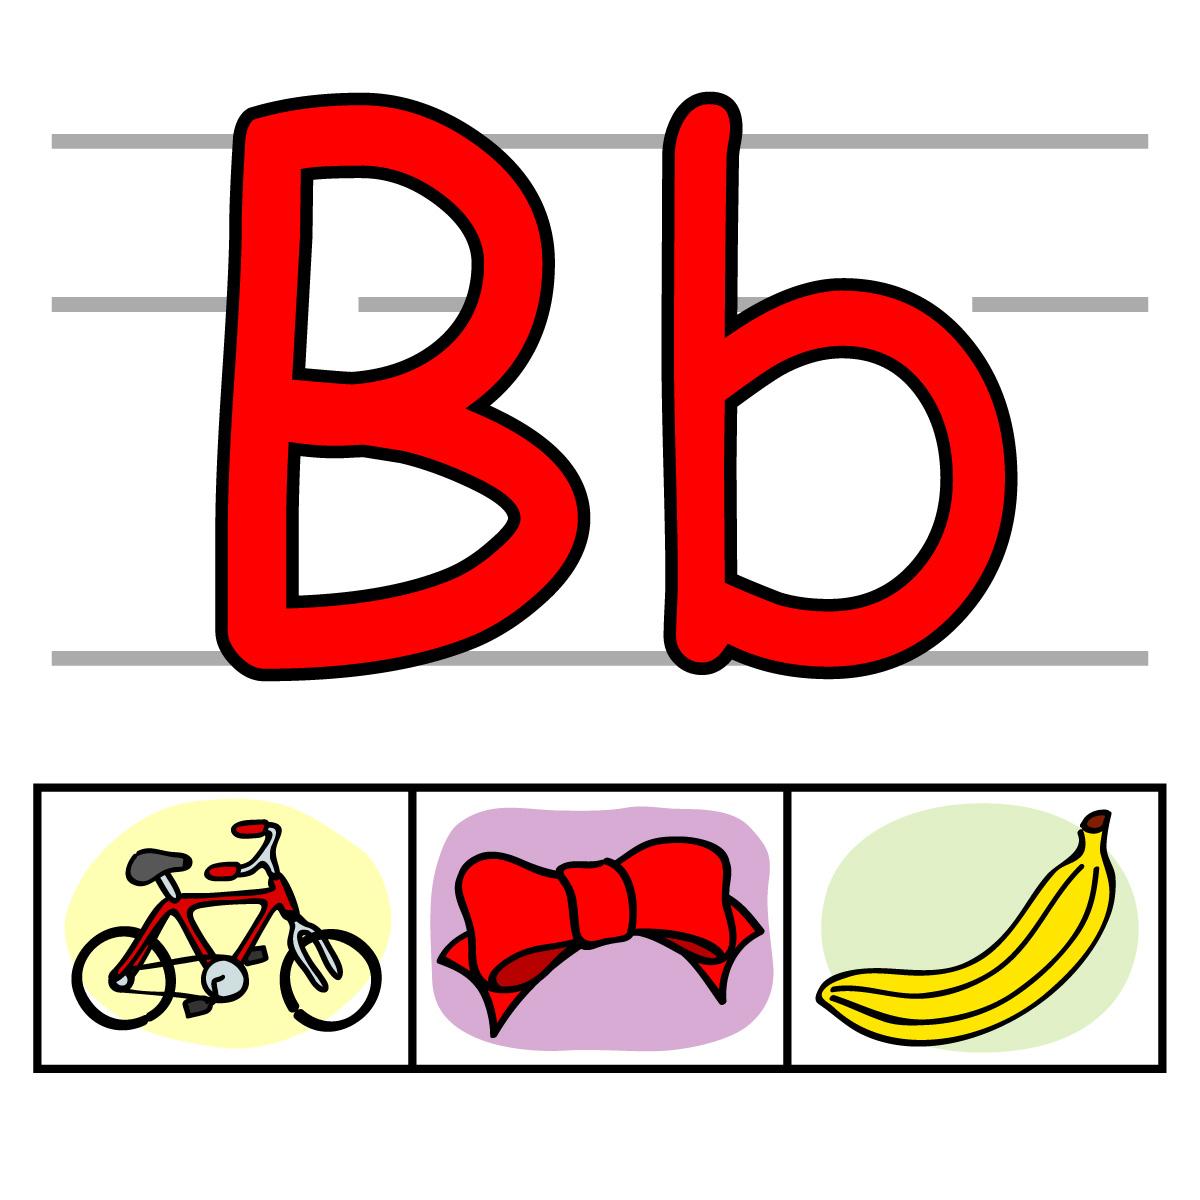 Lettering clipart writing letter Alphabet 0 letter Image letters